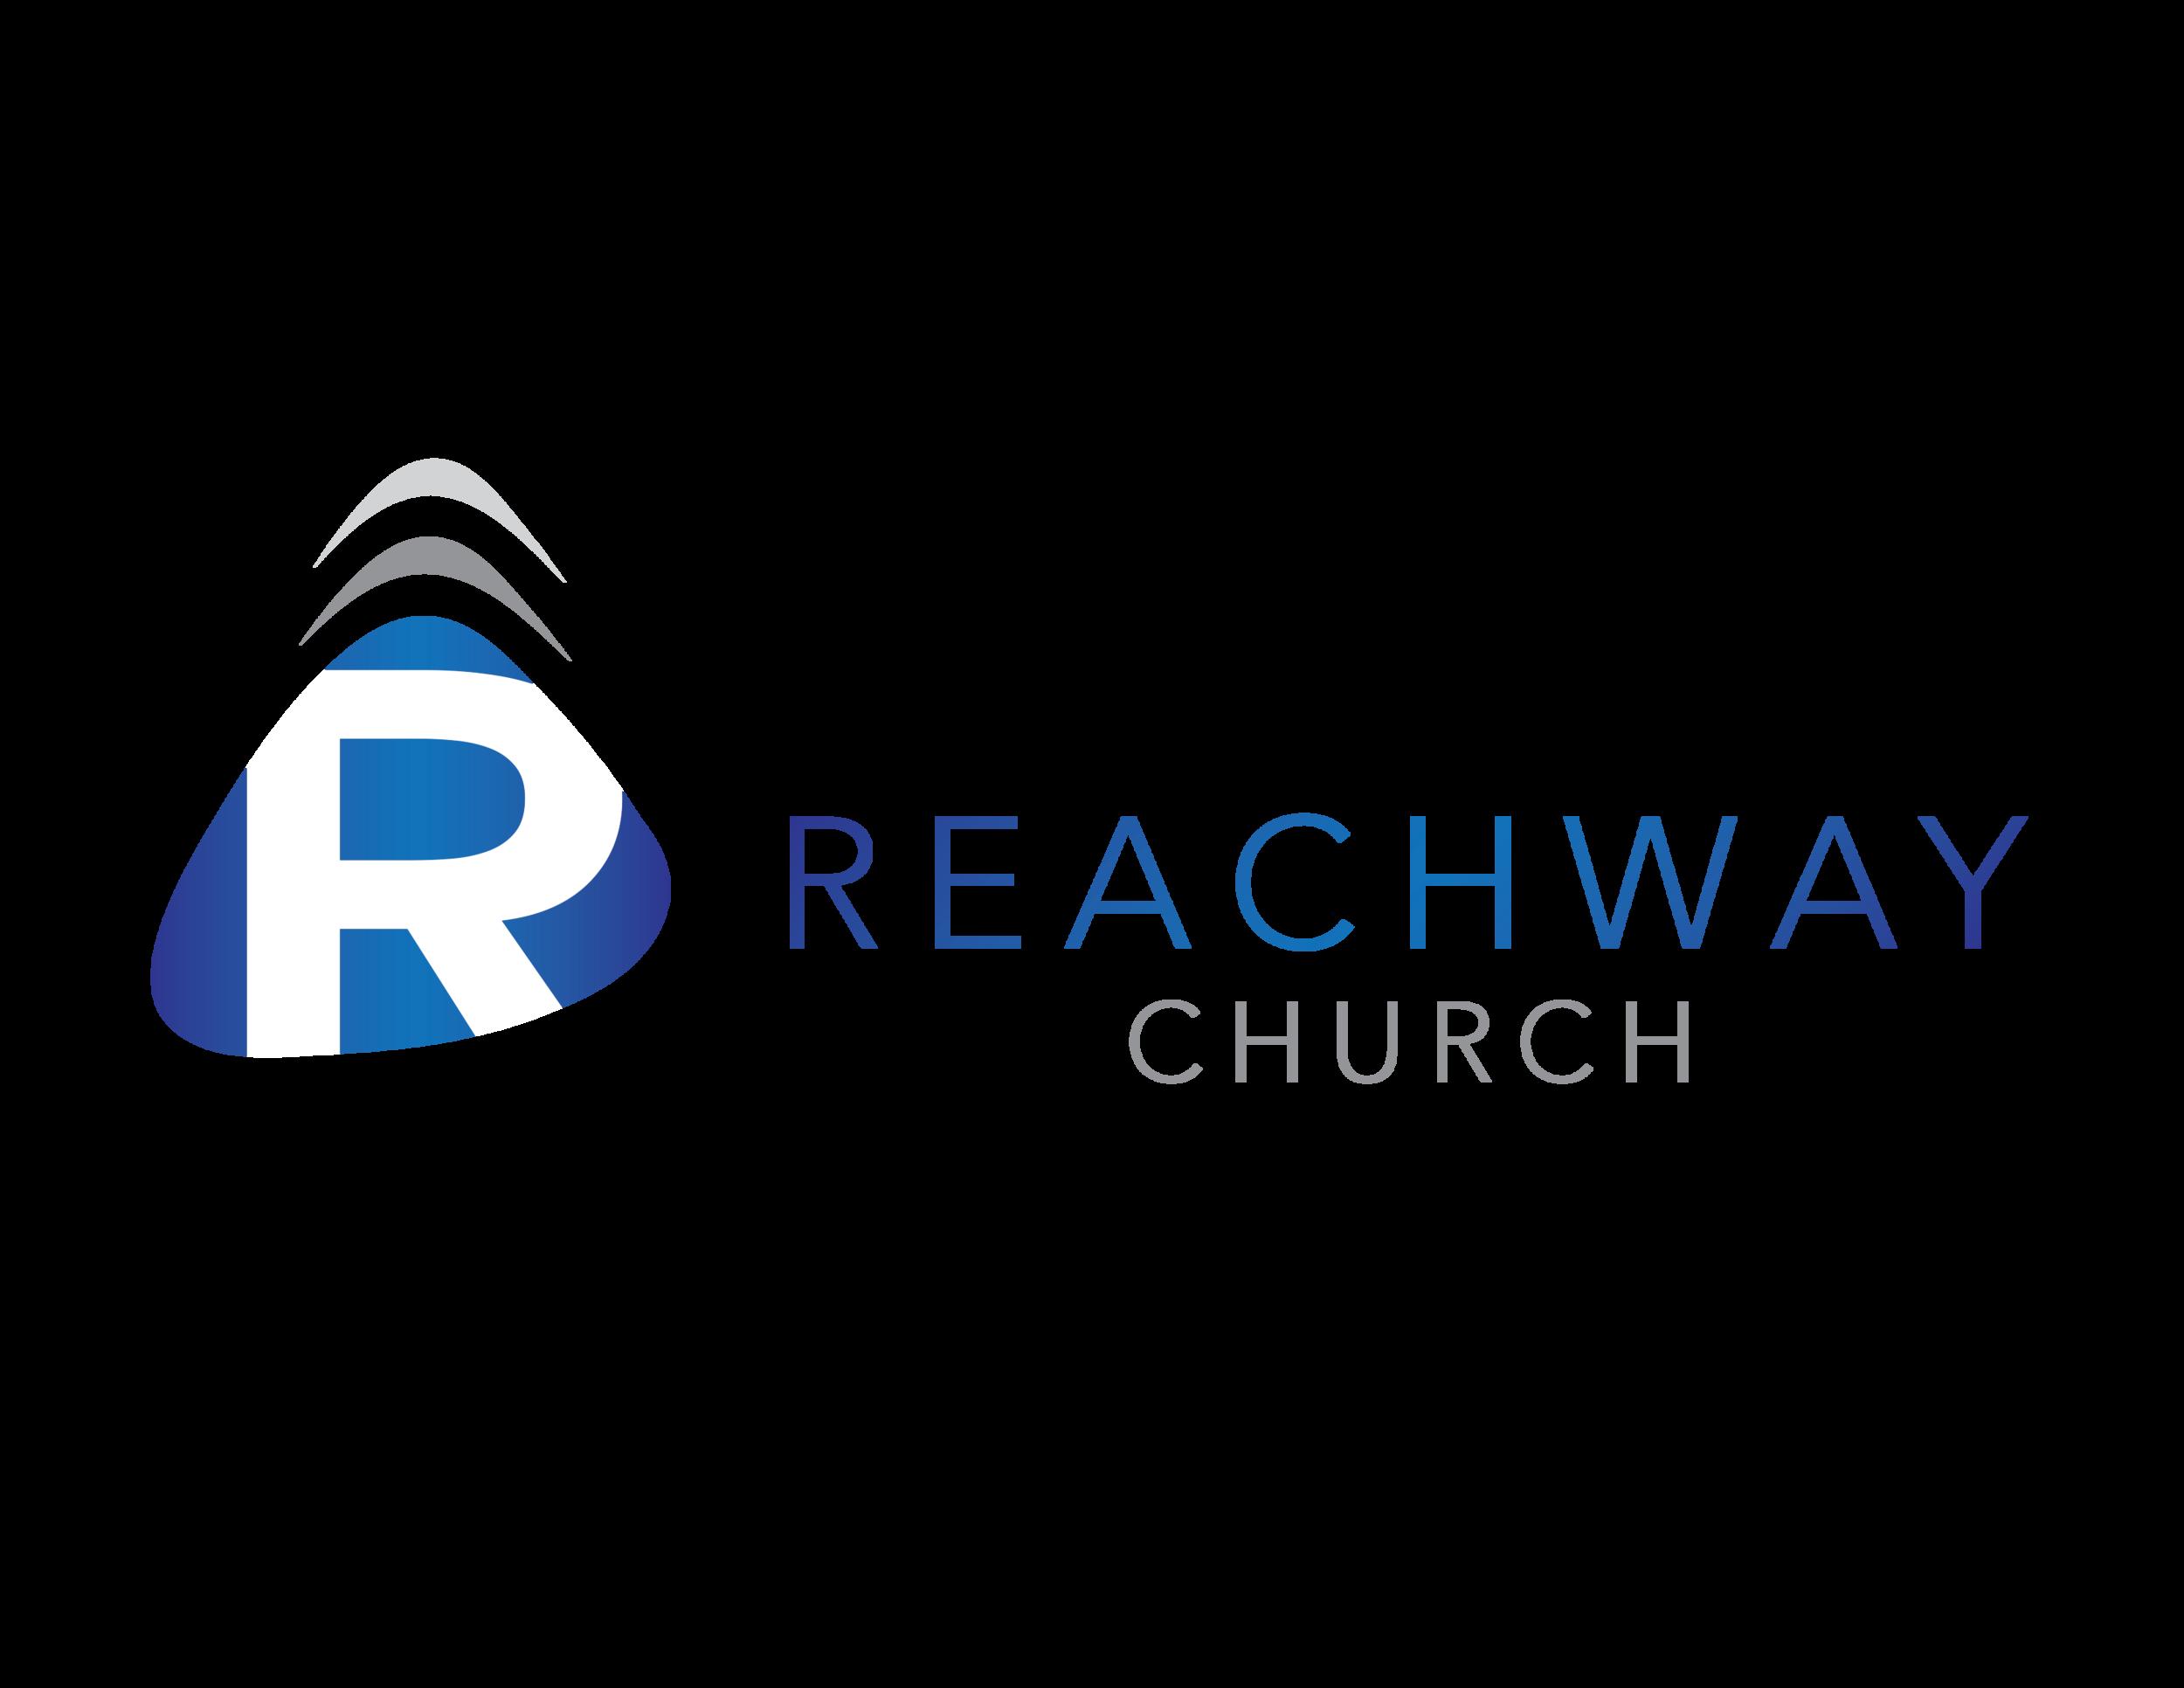 Reachway-Main-Logo.png